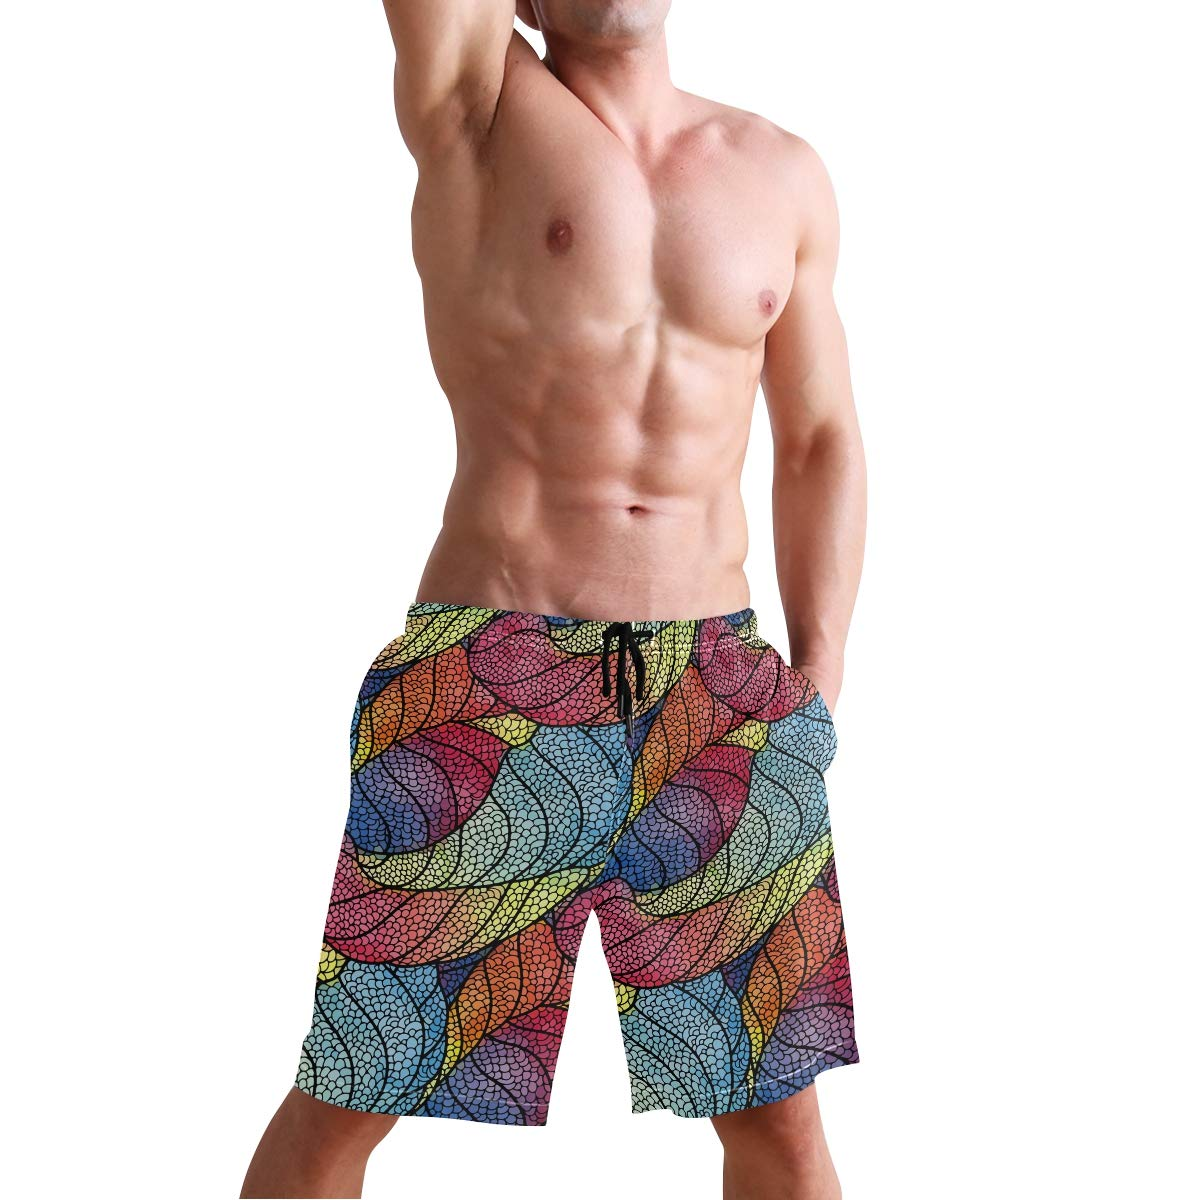 DEYYA Mens Feather Summer Beach Shorts Pants Swim Trunks Board Short for Men